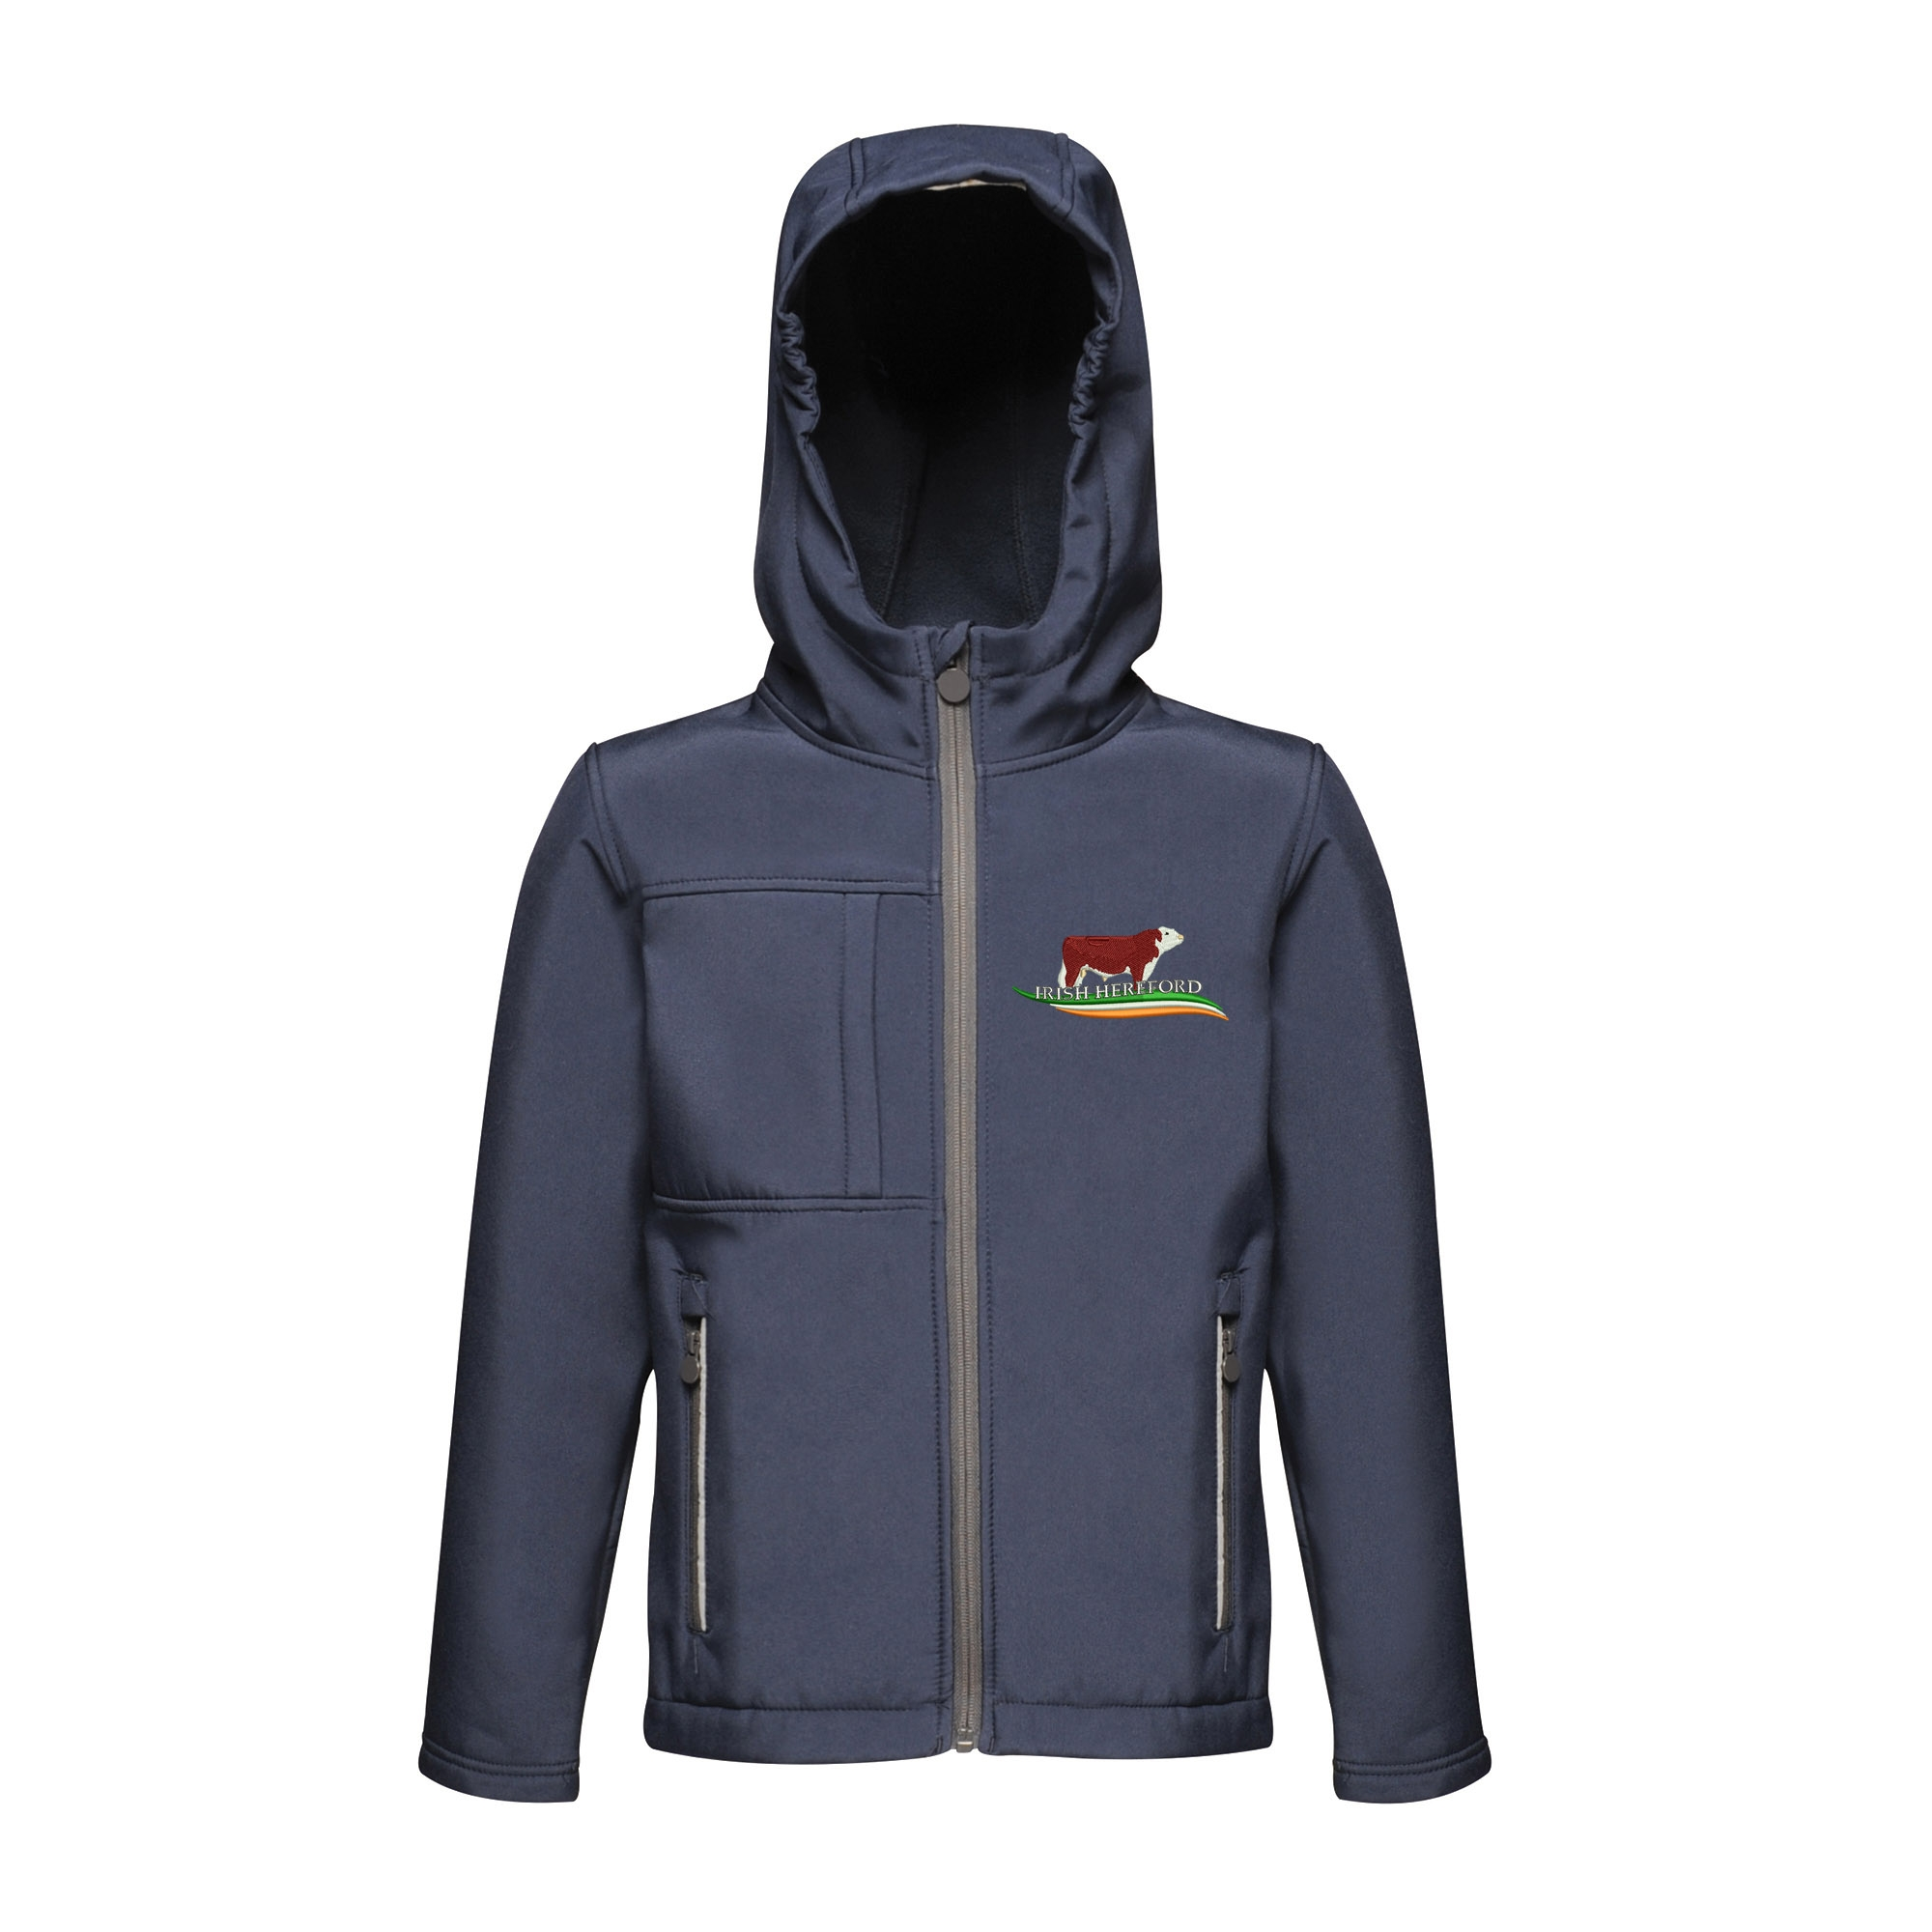 Irish Hereford Child Octagon Jacket